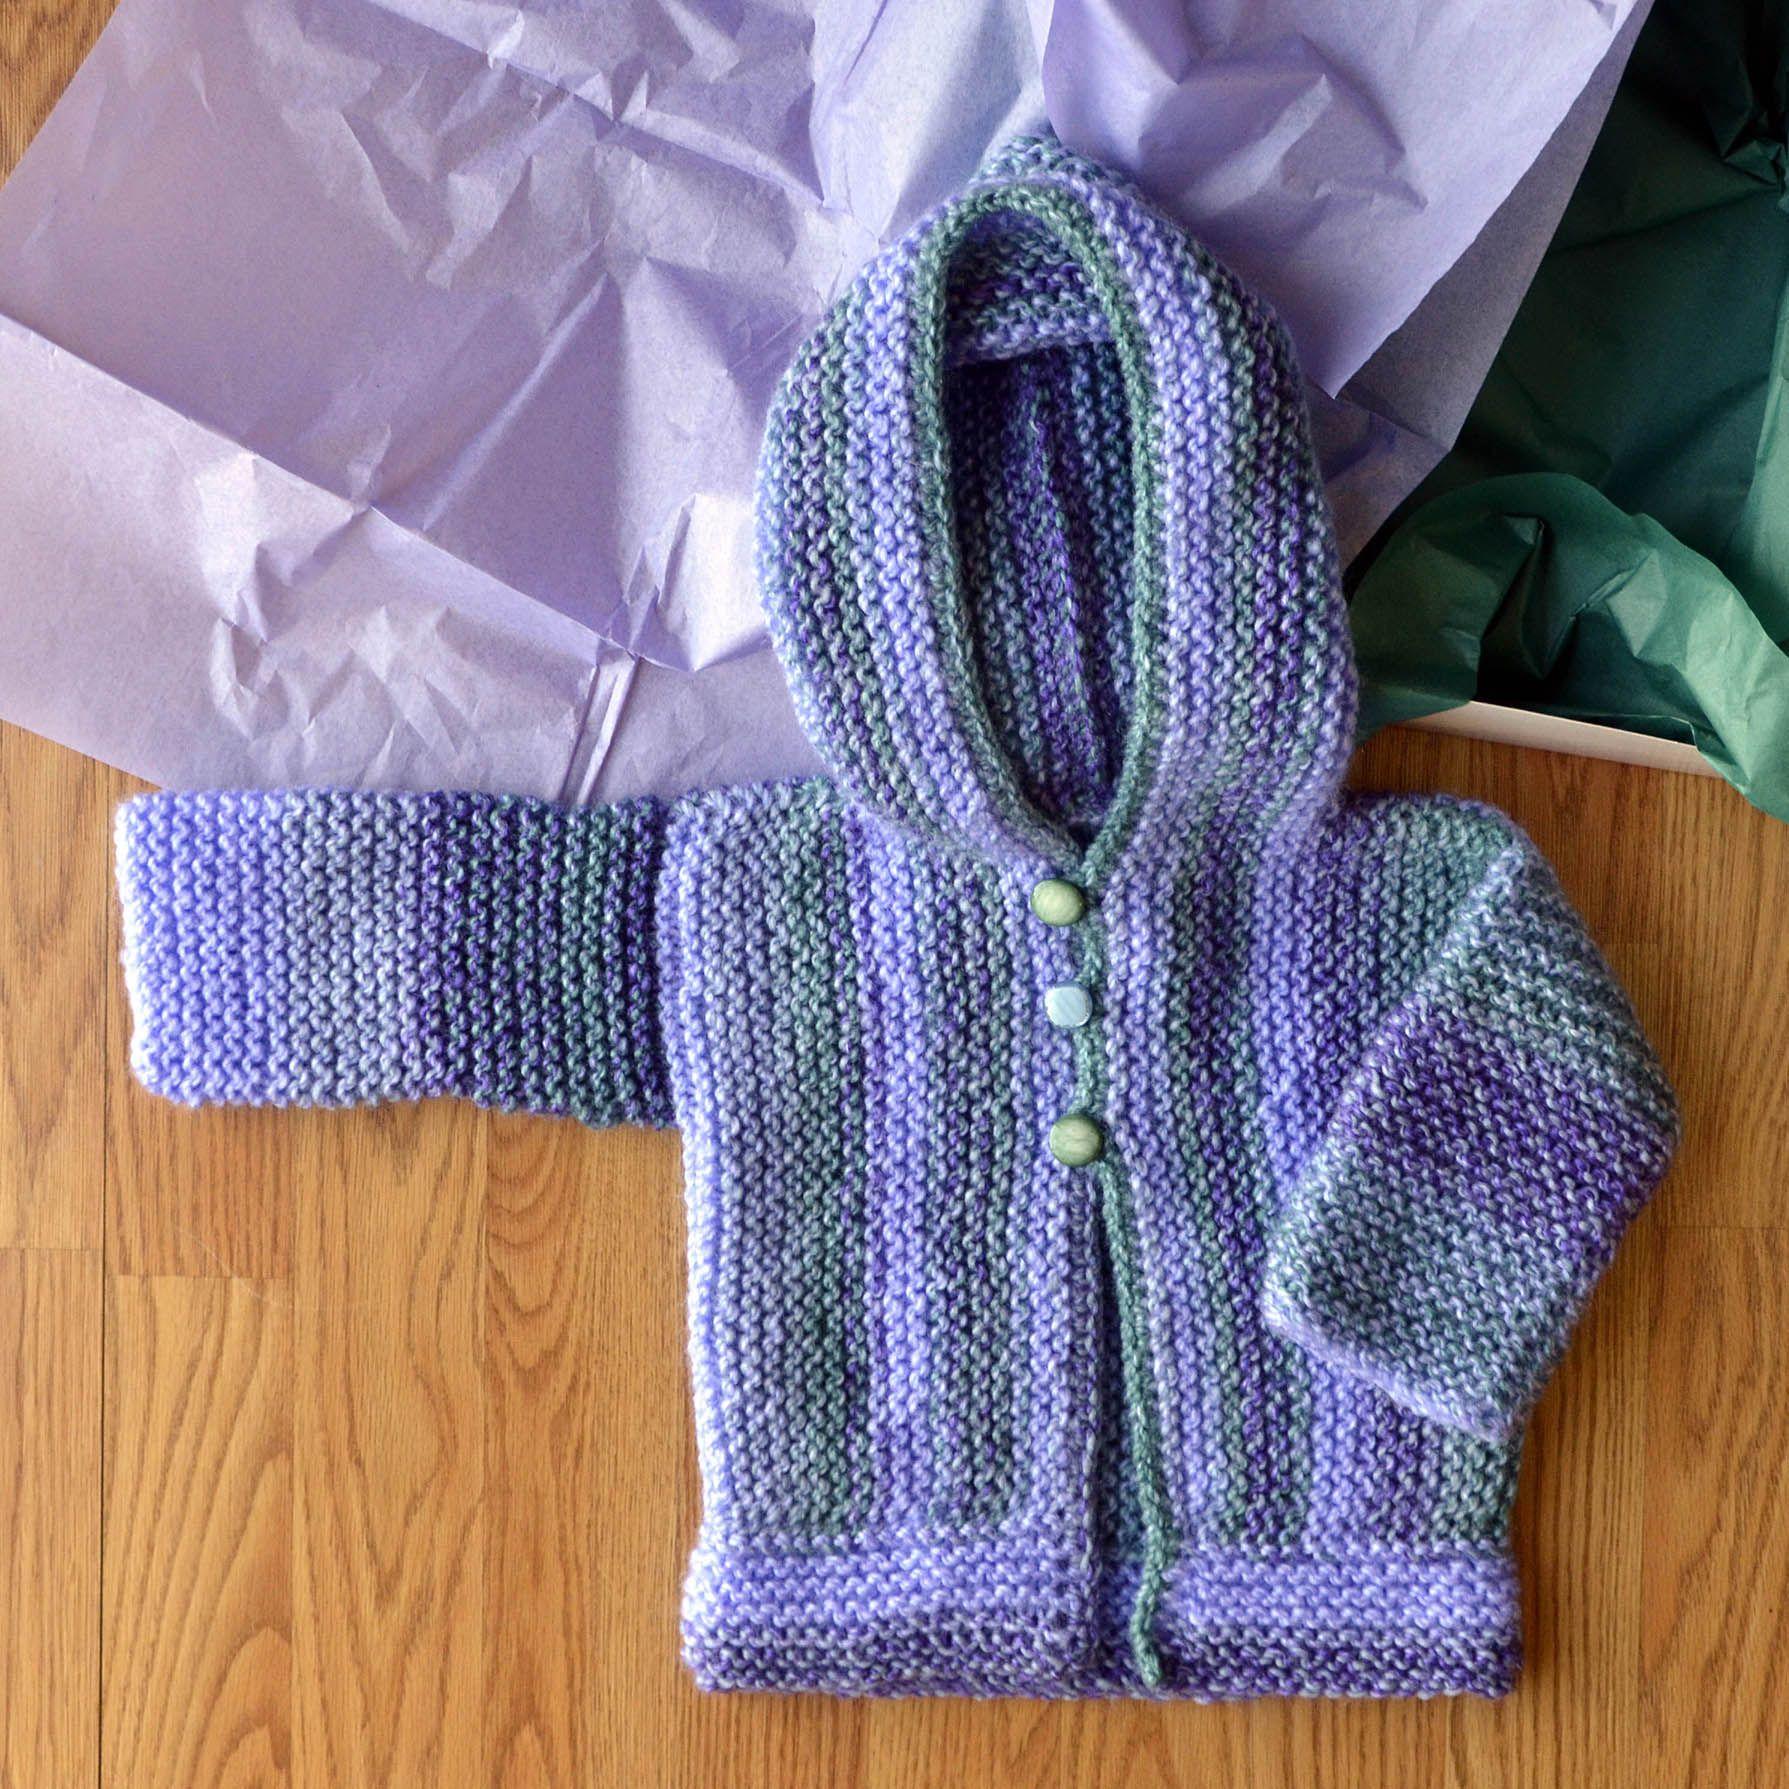 unique hand knitted baby boys cardigan//jacket /& hat newborn 0-3m 3-6m /& 6-12m